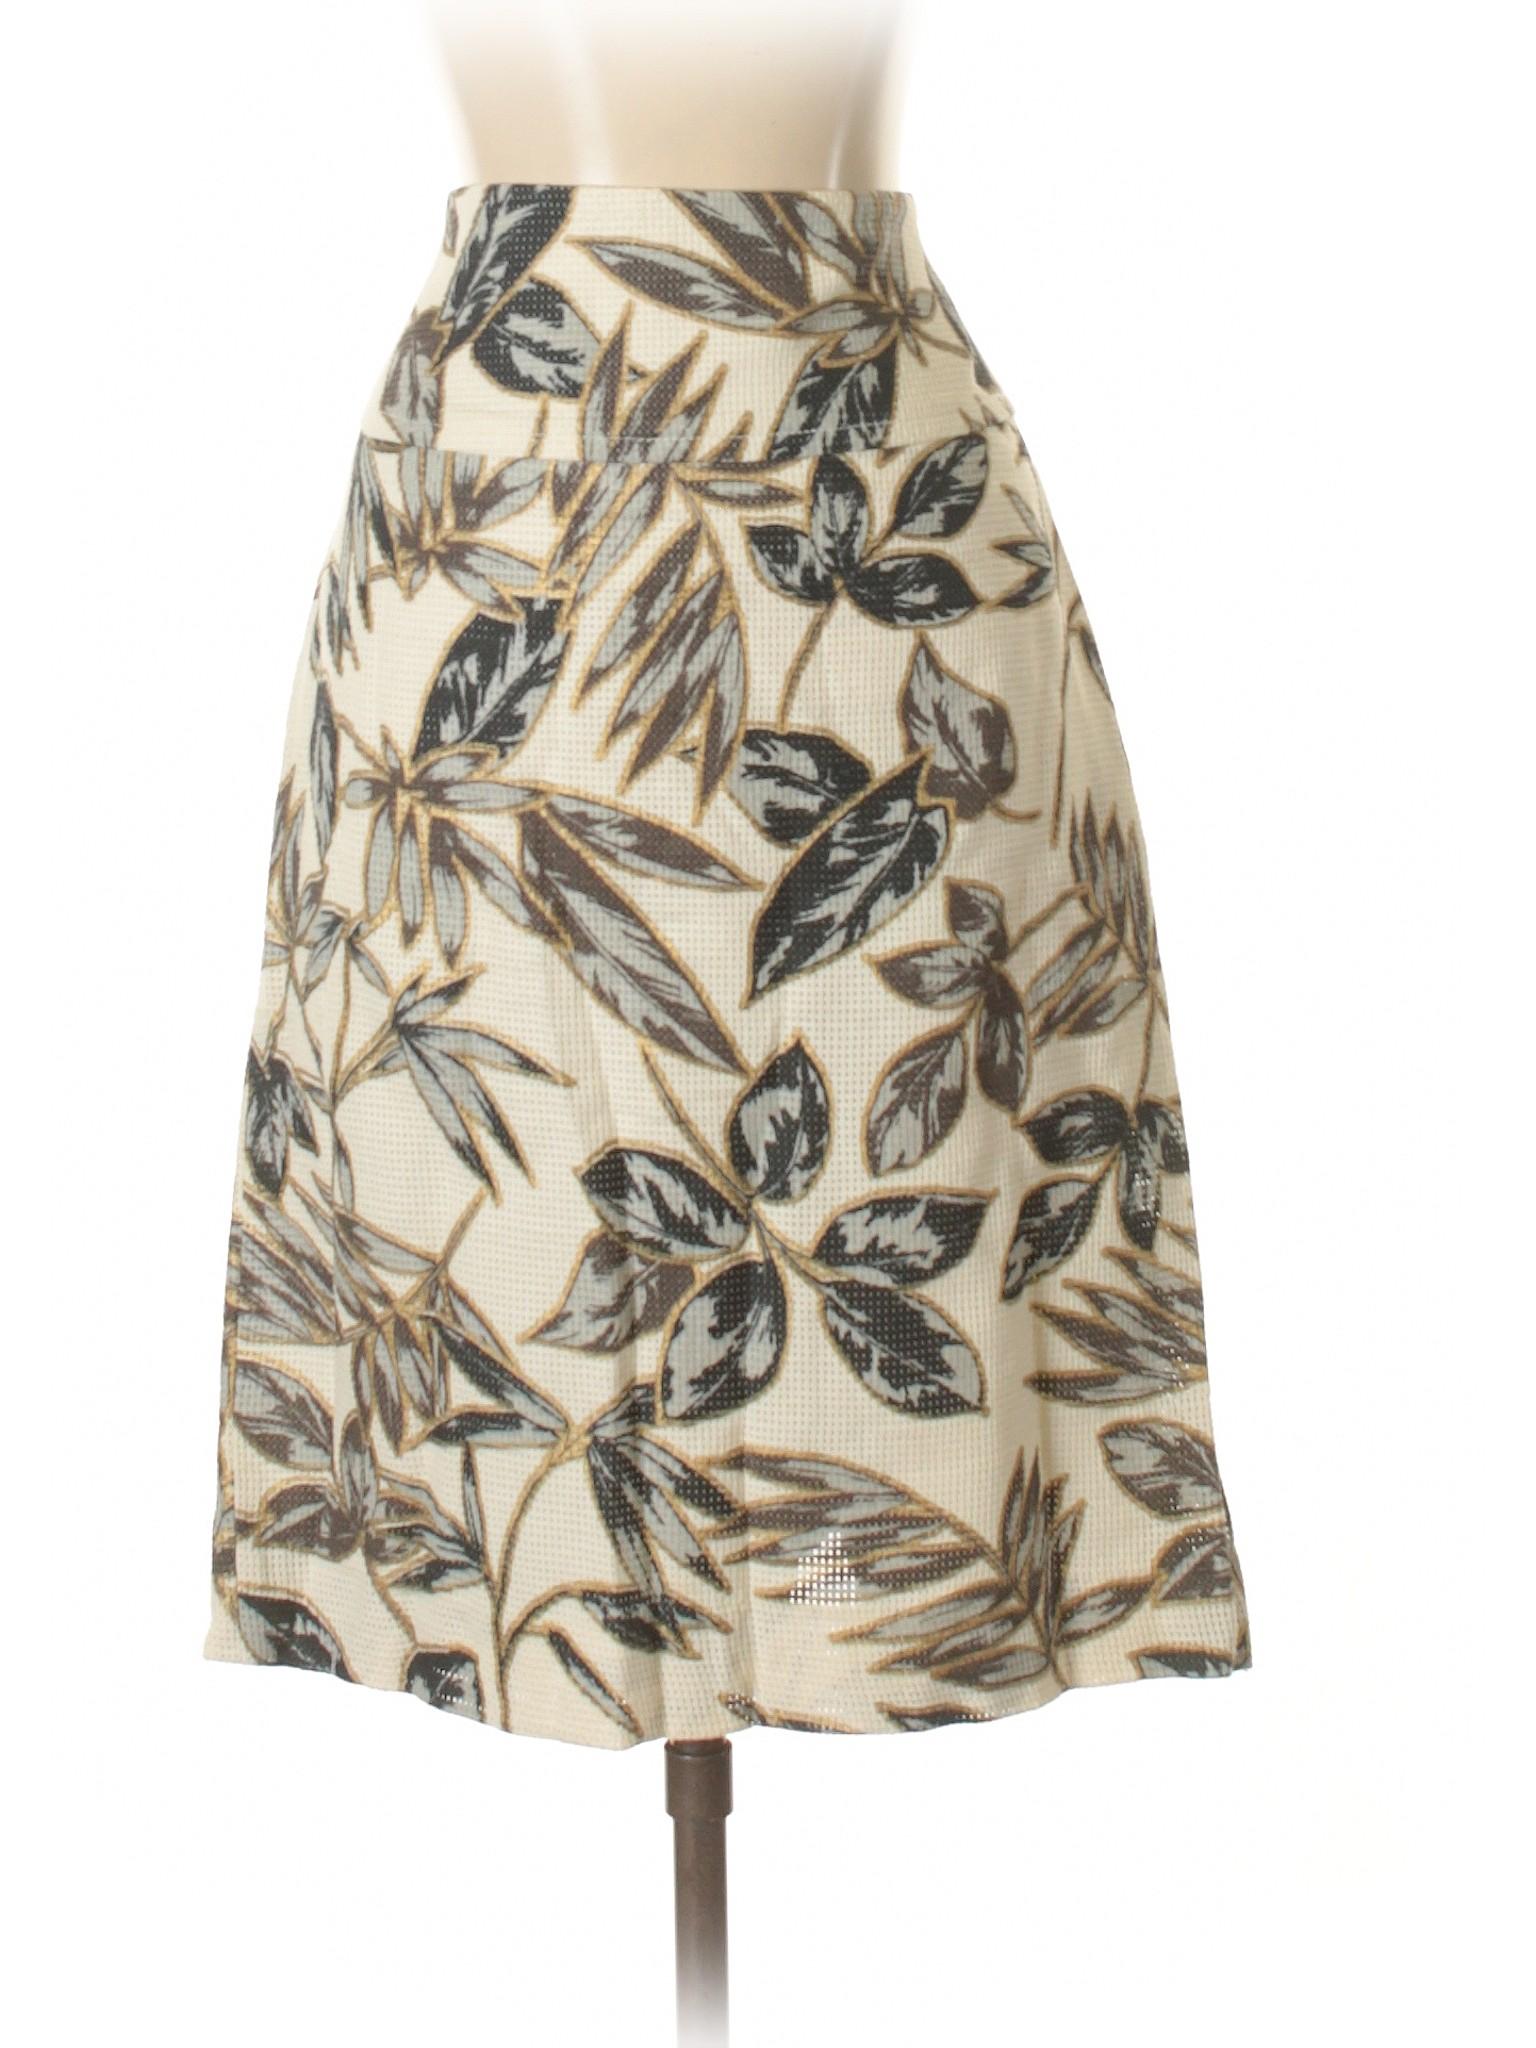 Boutique Skirt leisure Casual J Crew xOPv7C8